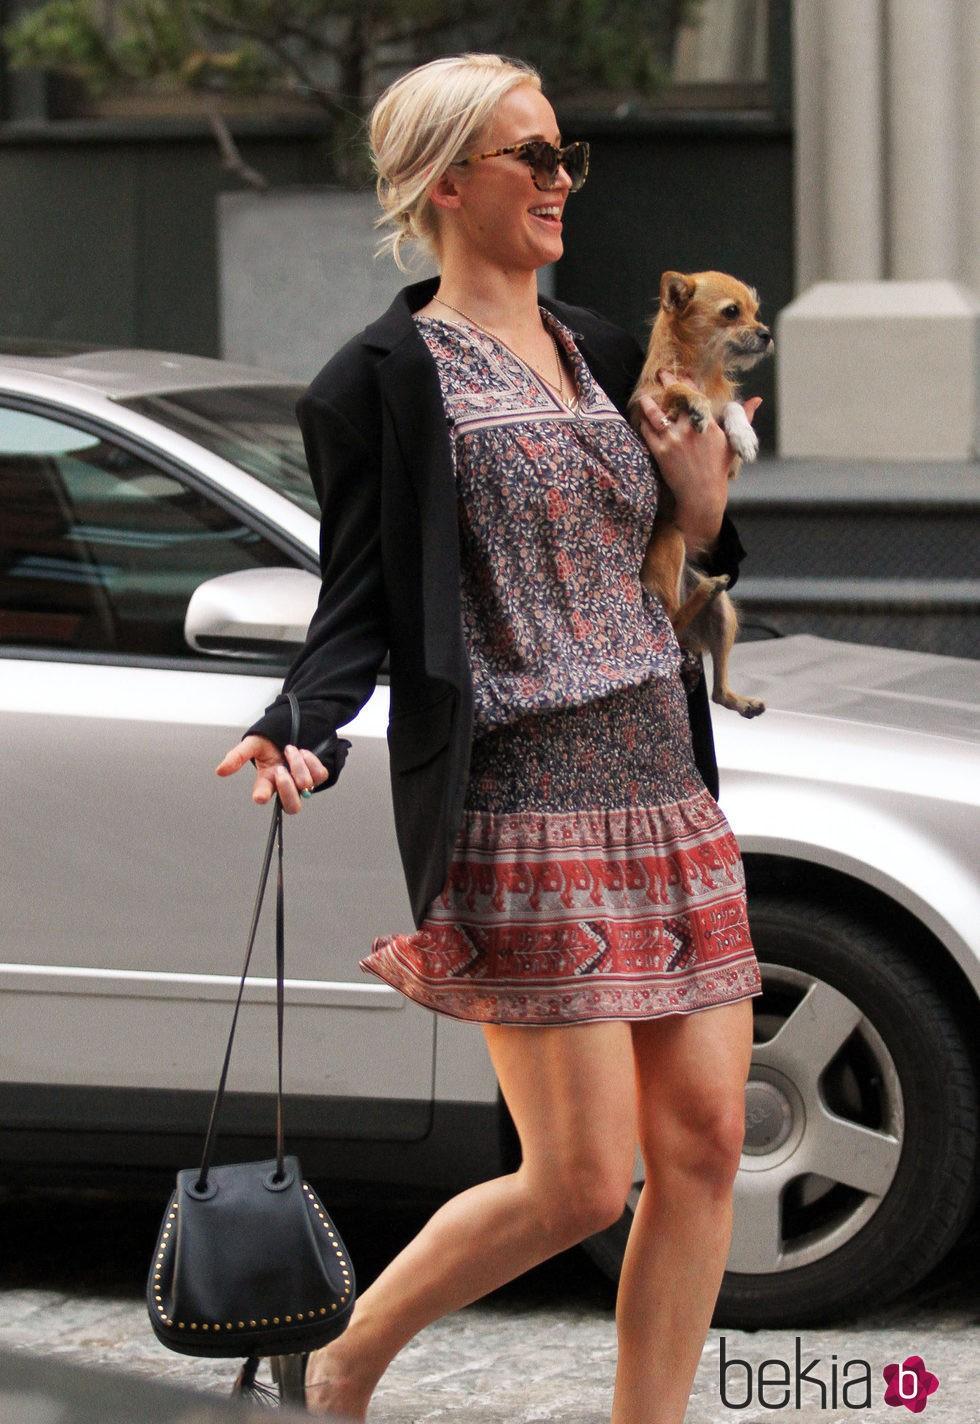 Jennifer Lawrence paseando a su perro Pippi  en vestido hippie